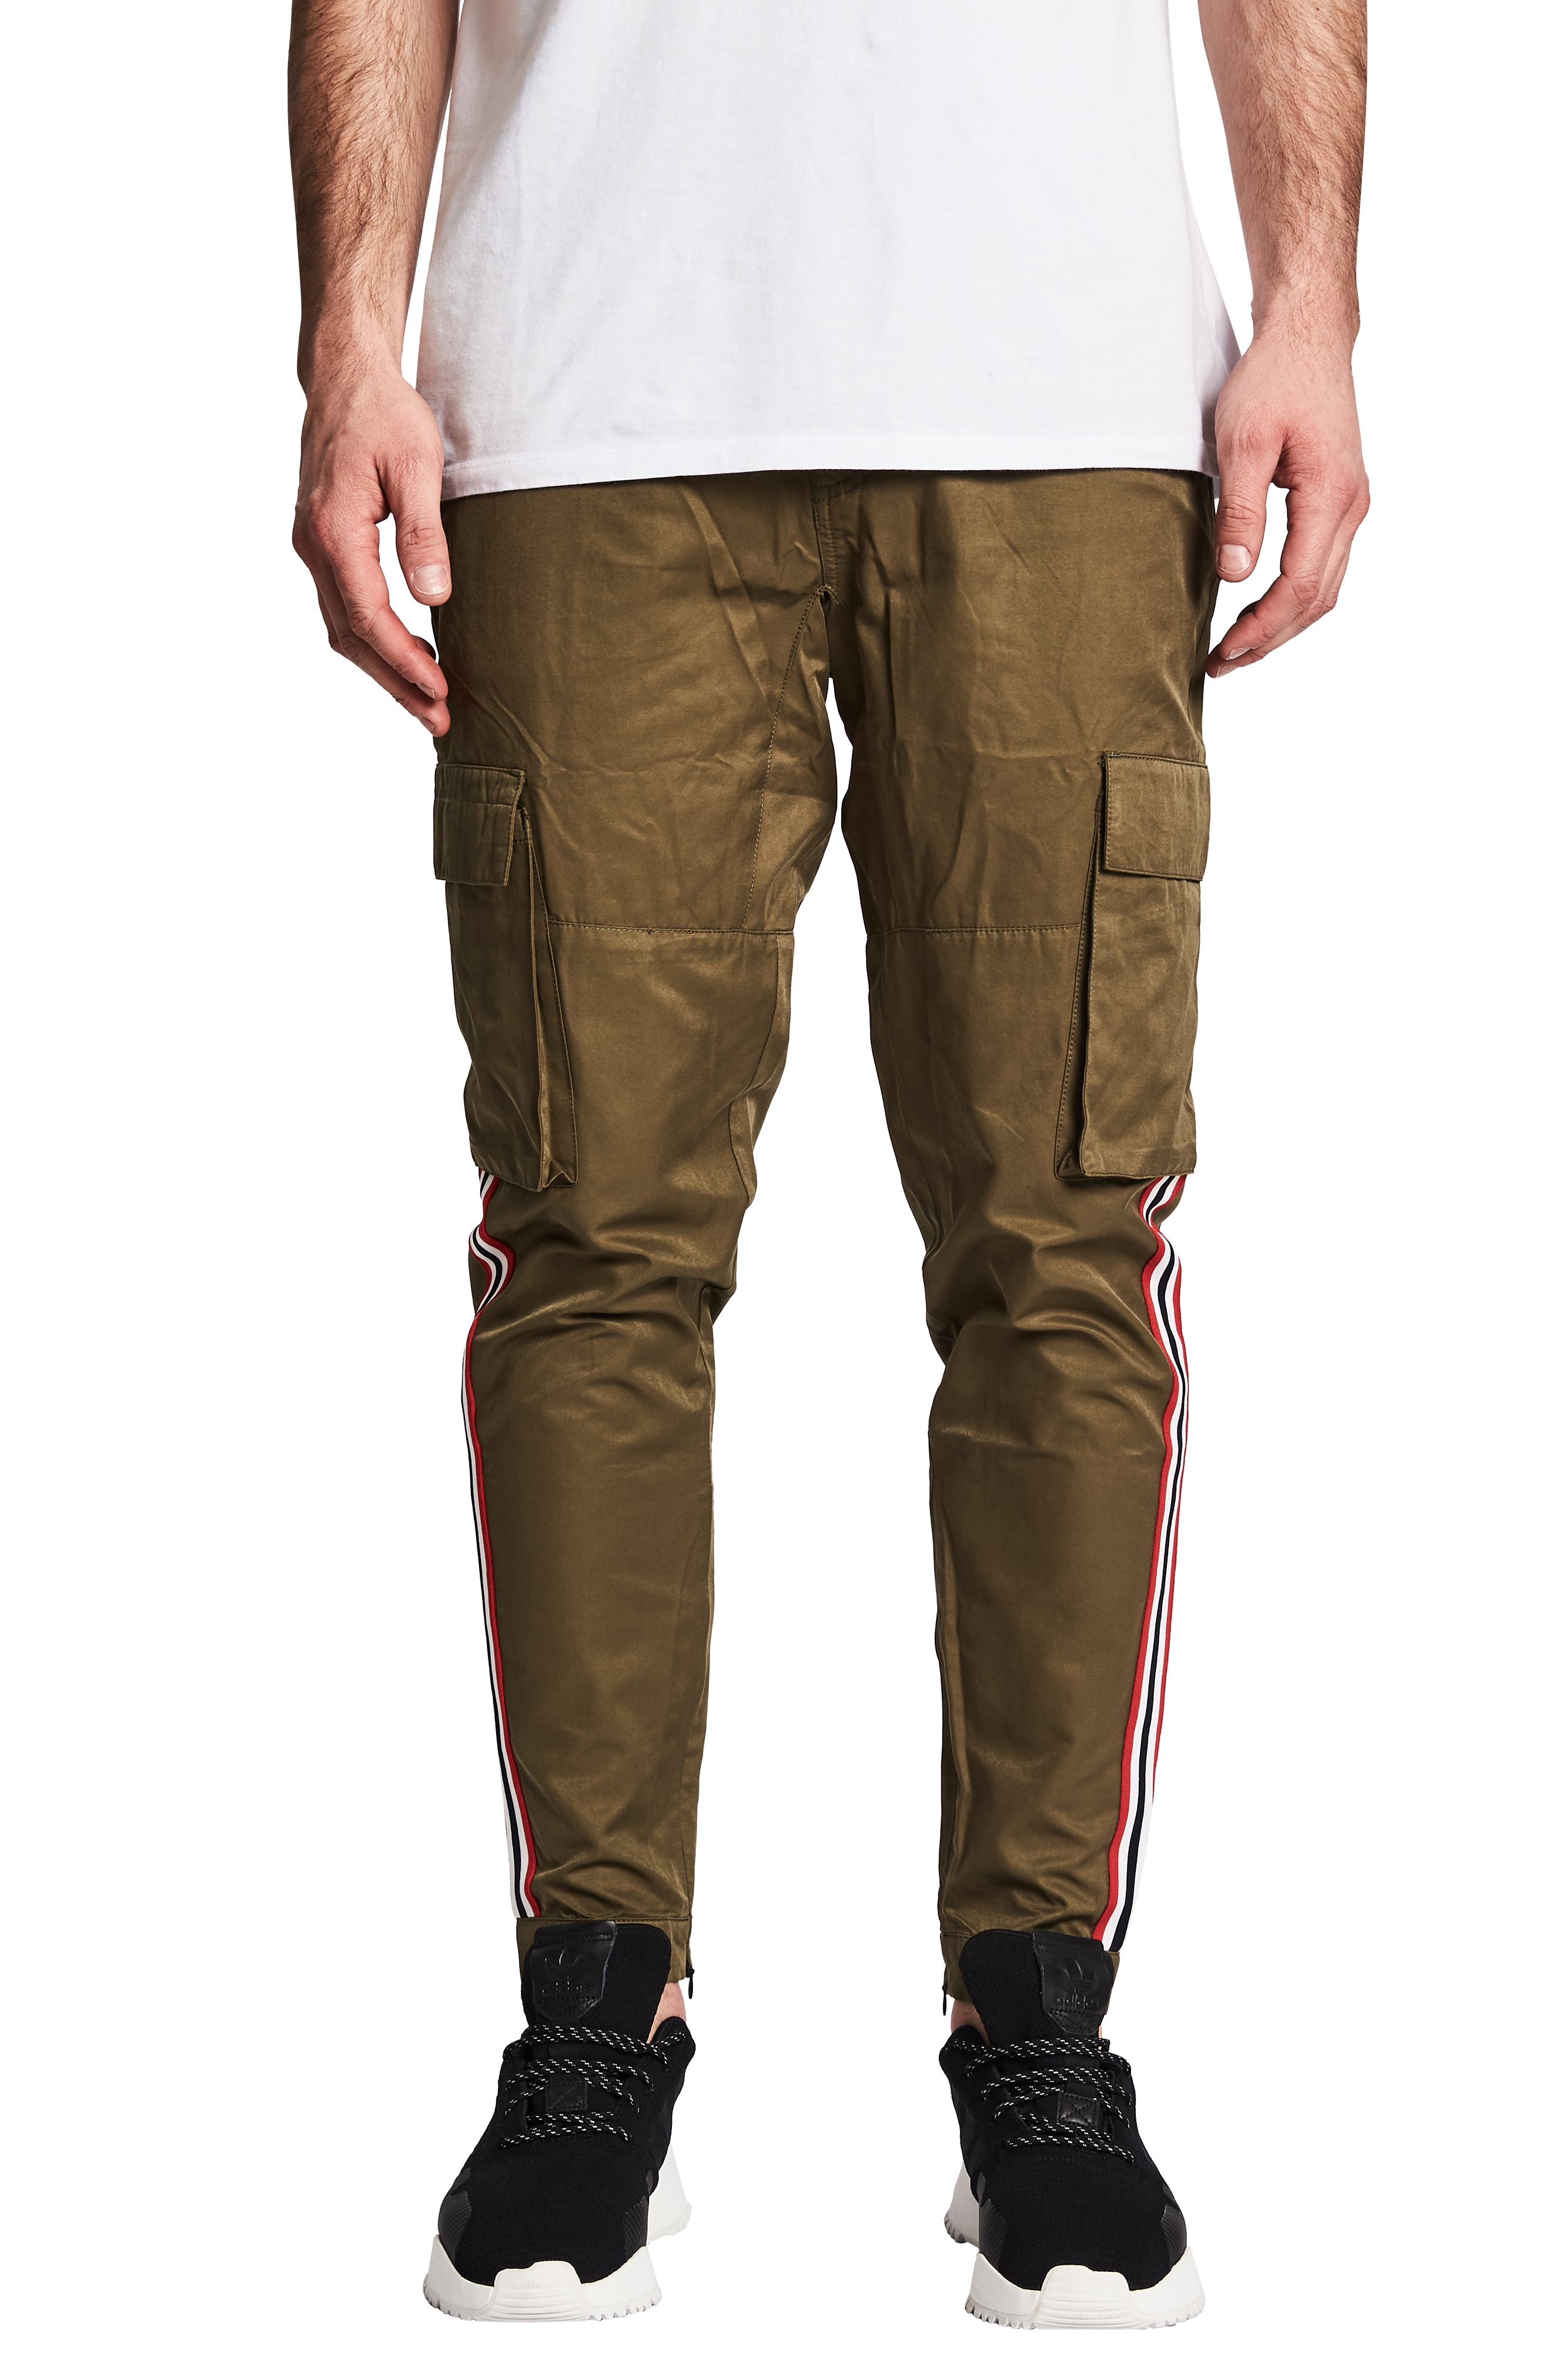 Nxp Viper Slim Fit Cargo Pants, Green